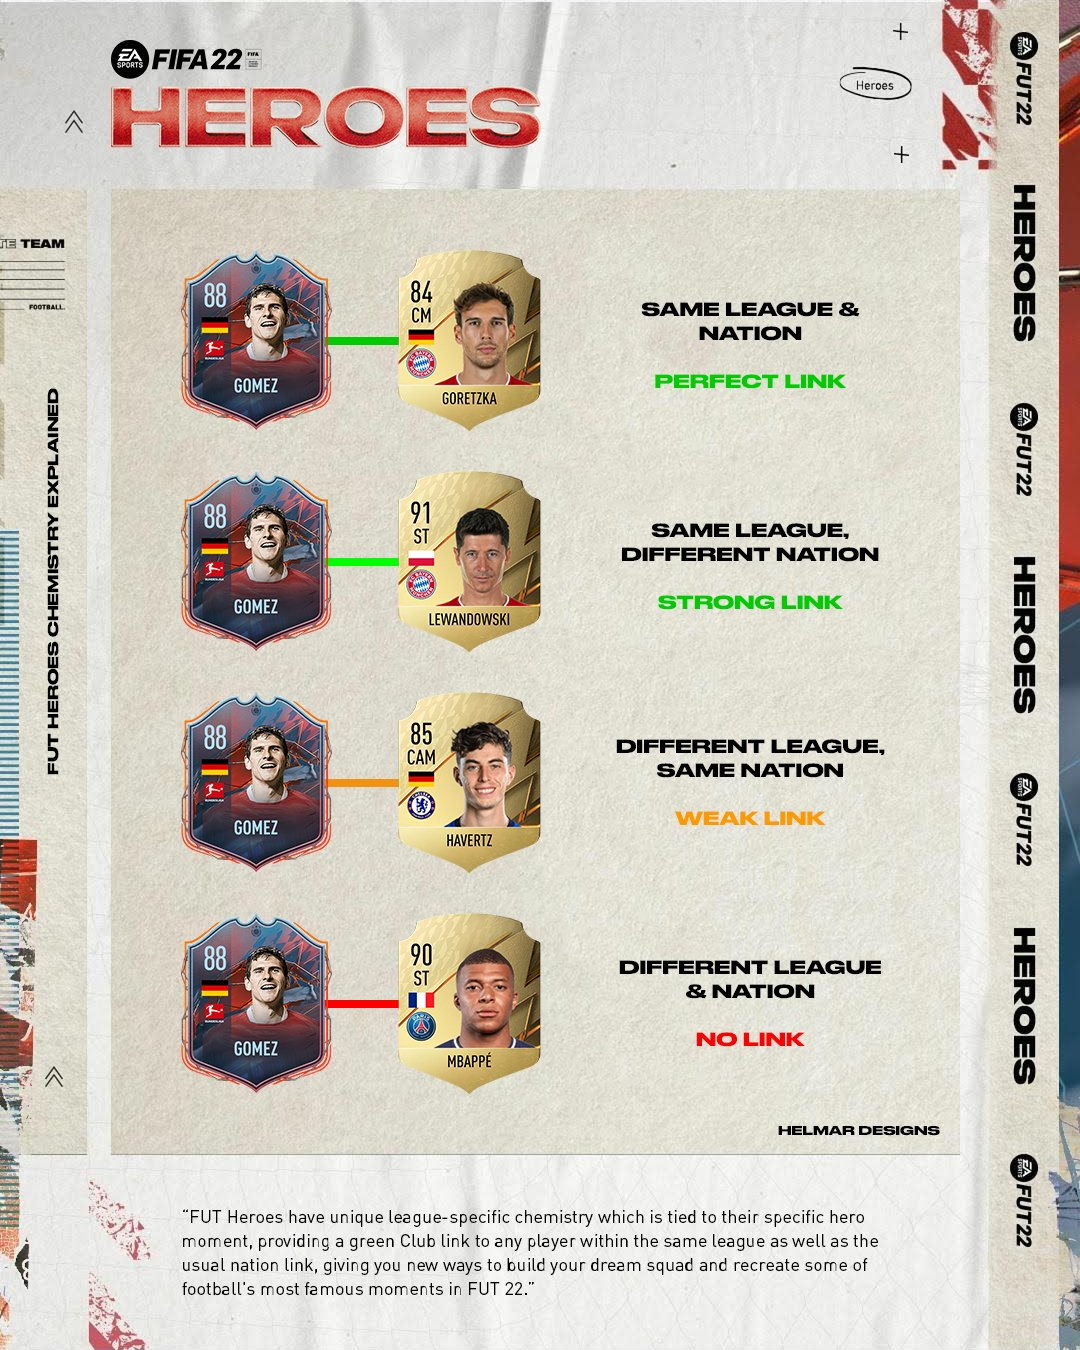 Fifa 22 FUT Heroes Chemistry explained